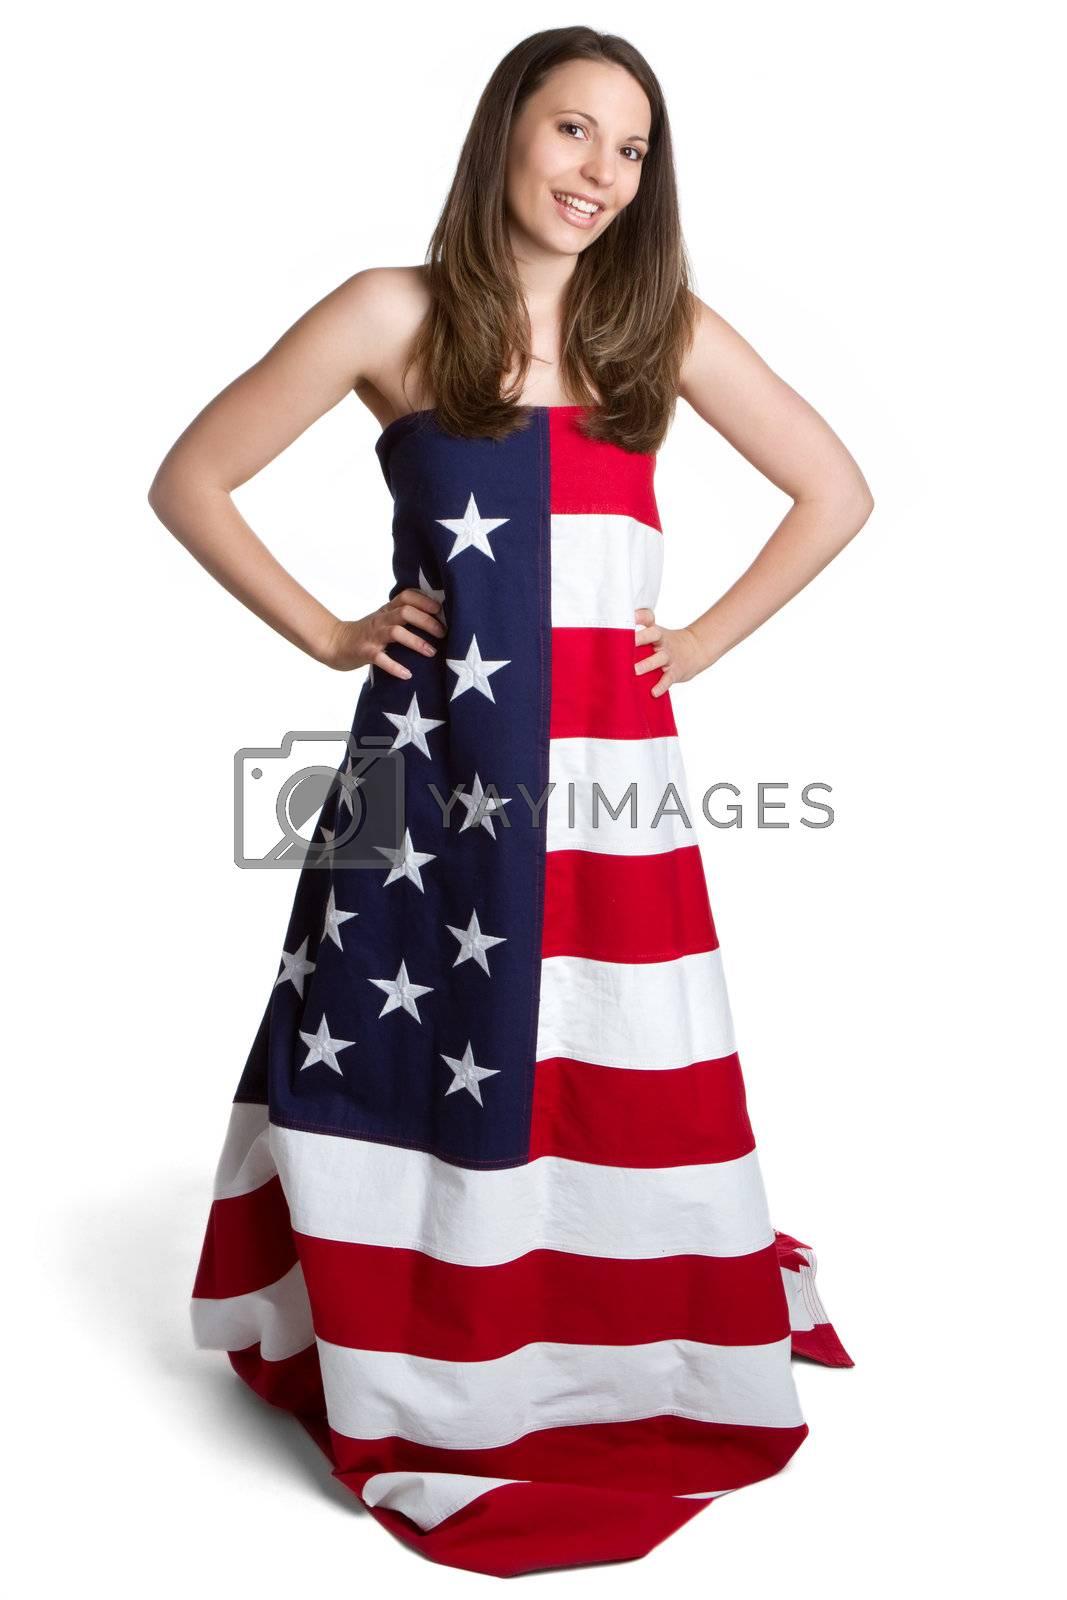 Woman wearing american flag dress